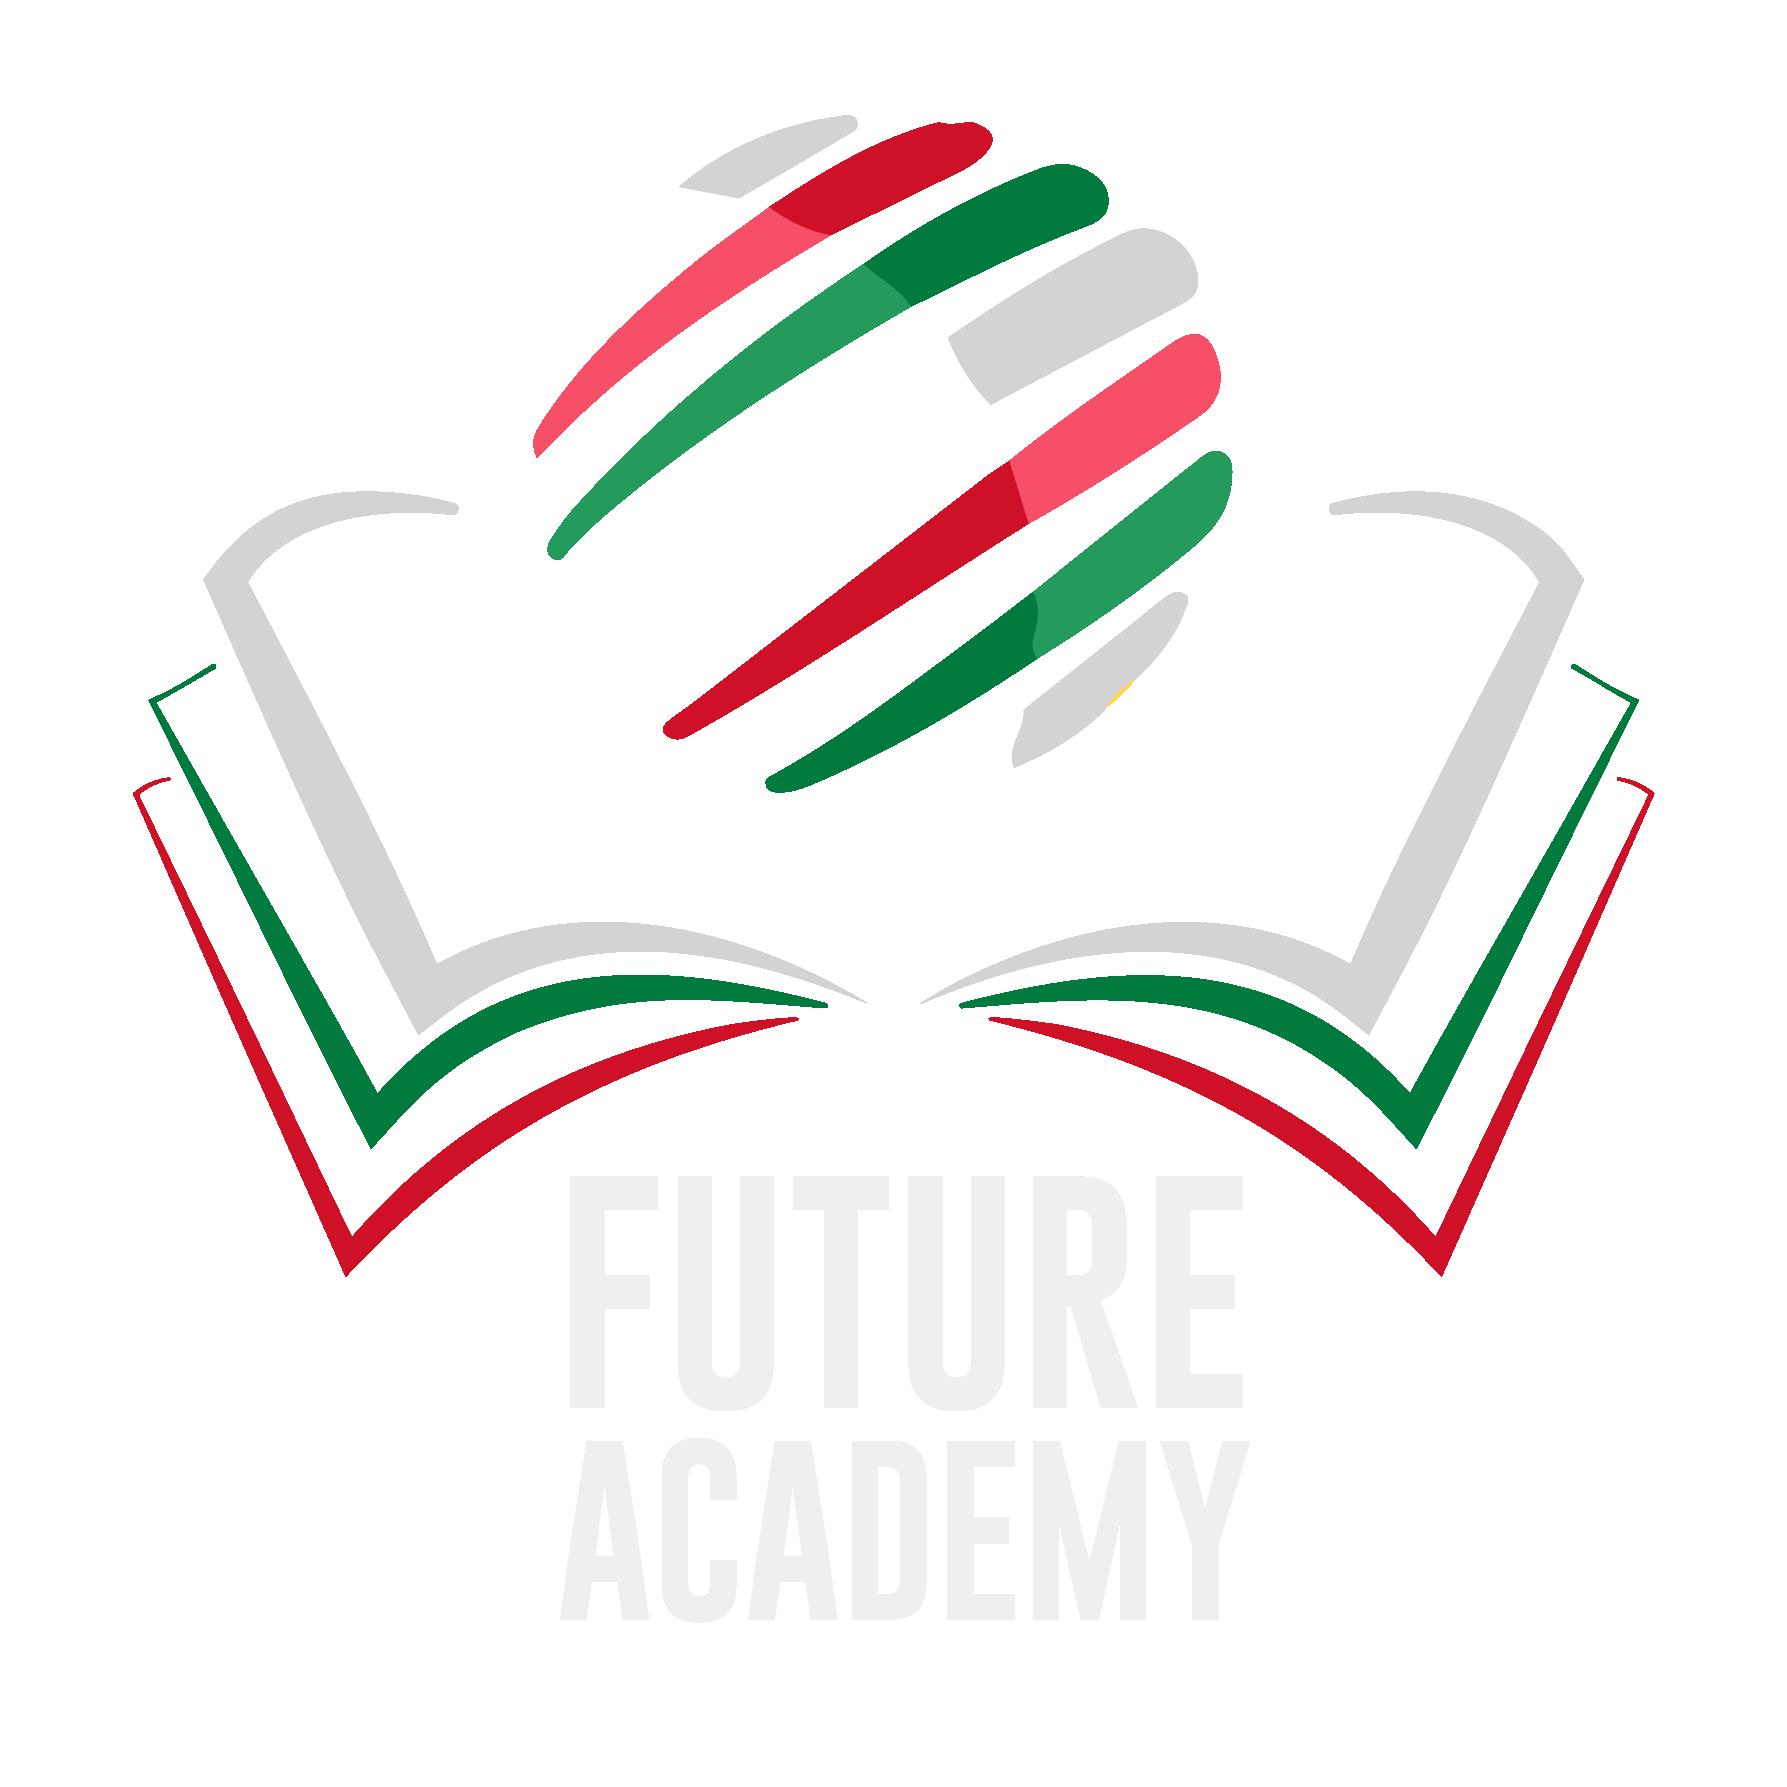 Future Academy